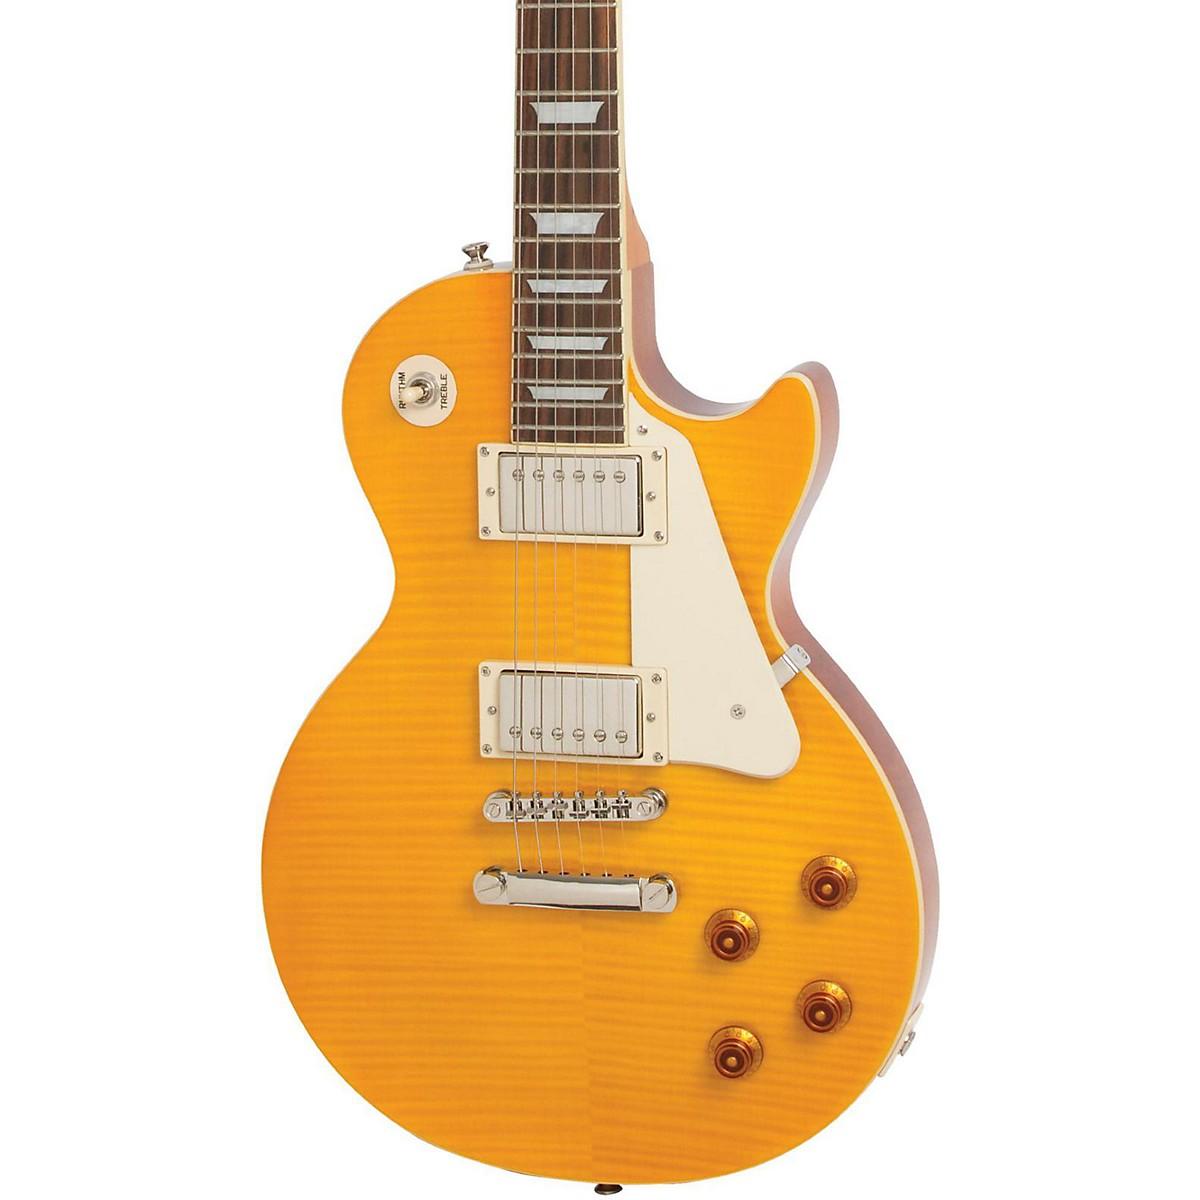 Epiphone Limited Edition Les Paul PlusTop PRO Electric Guitar